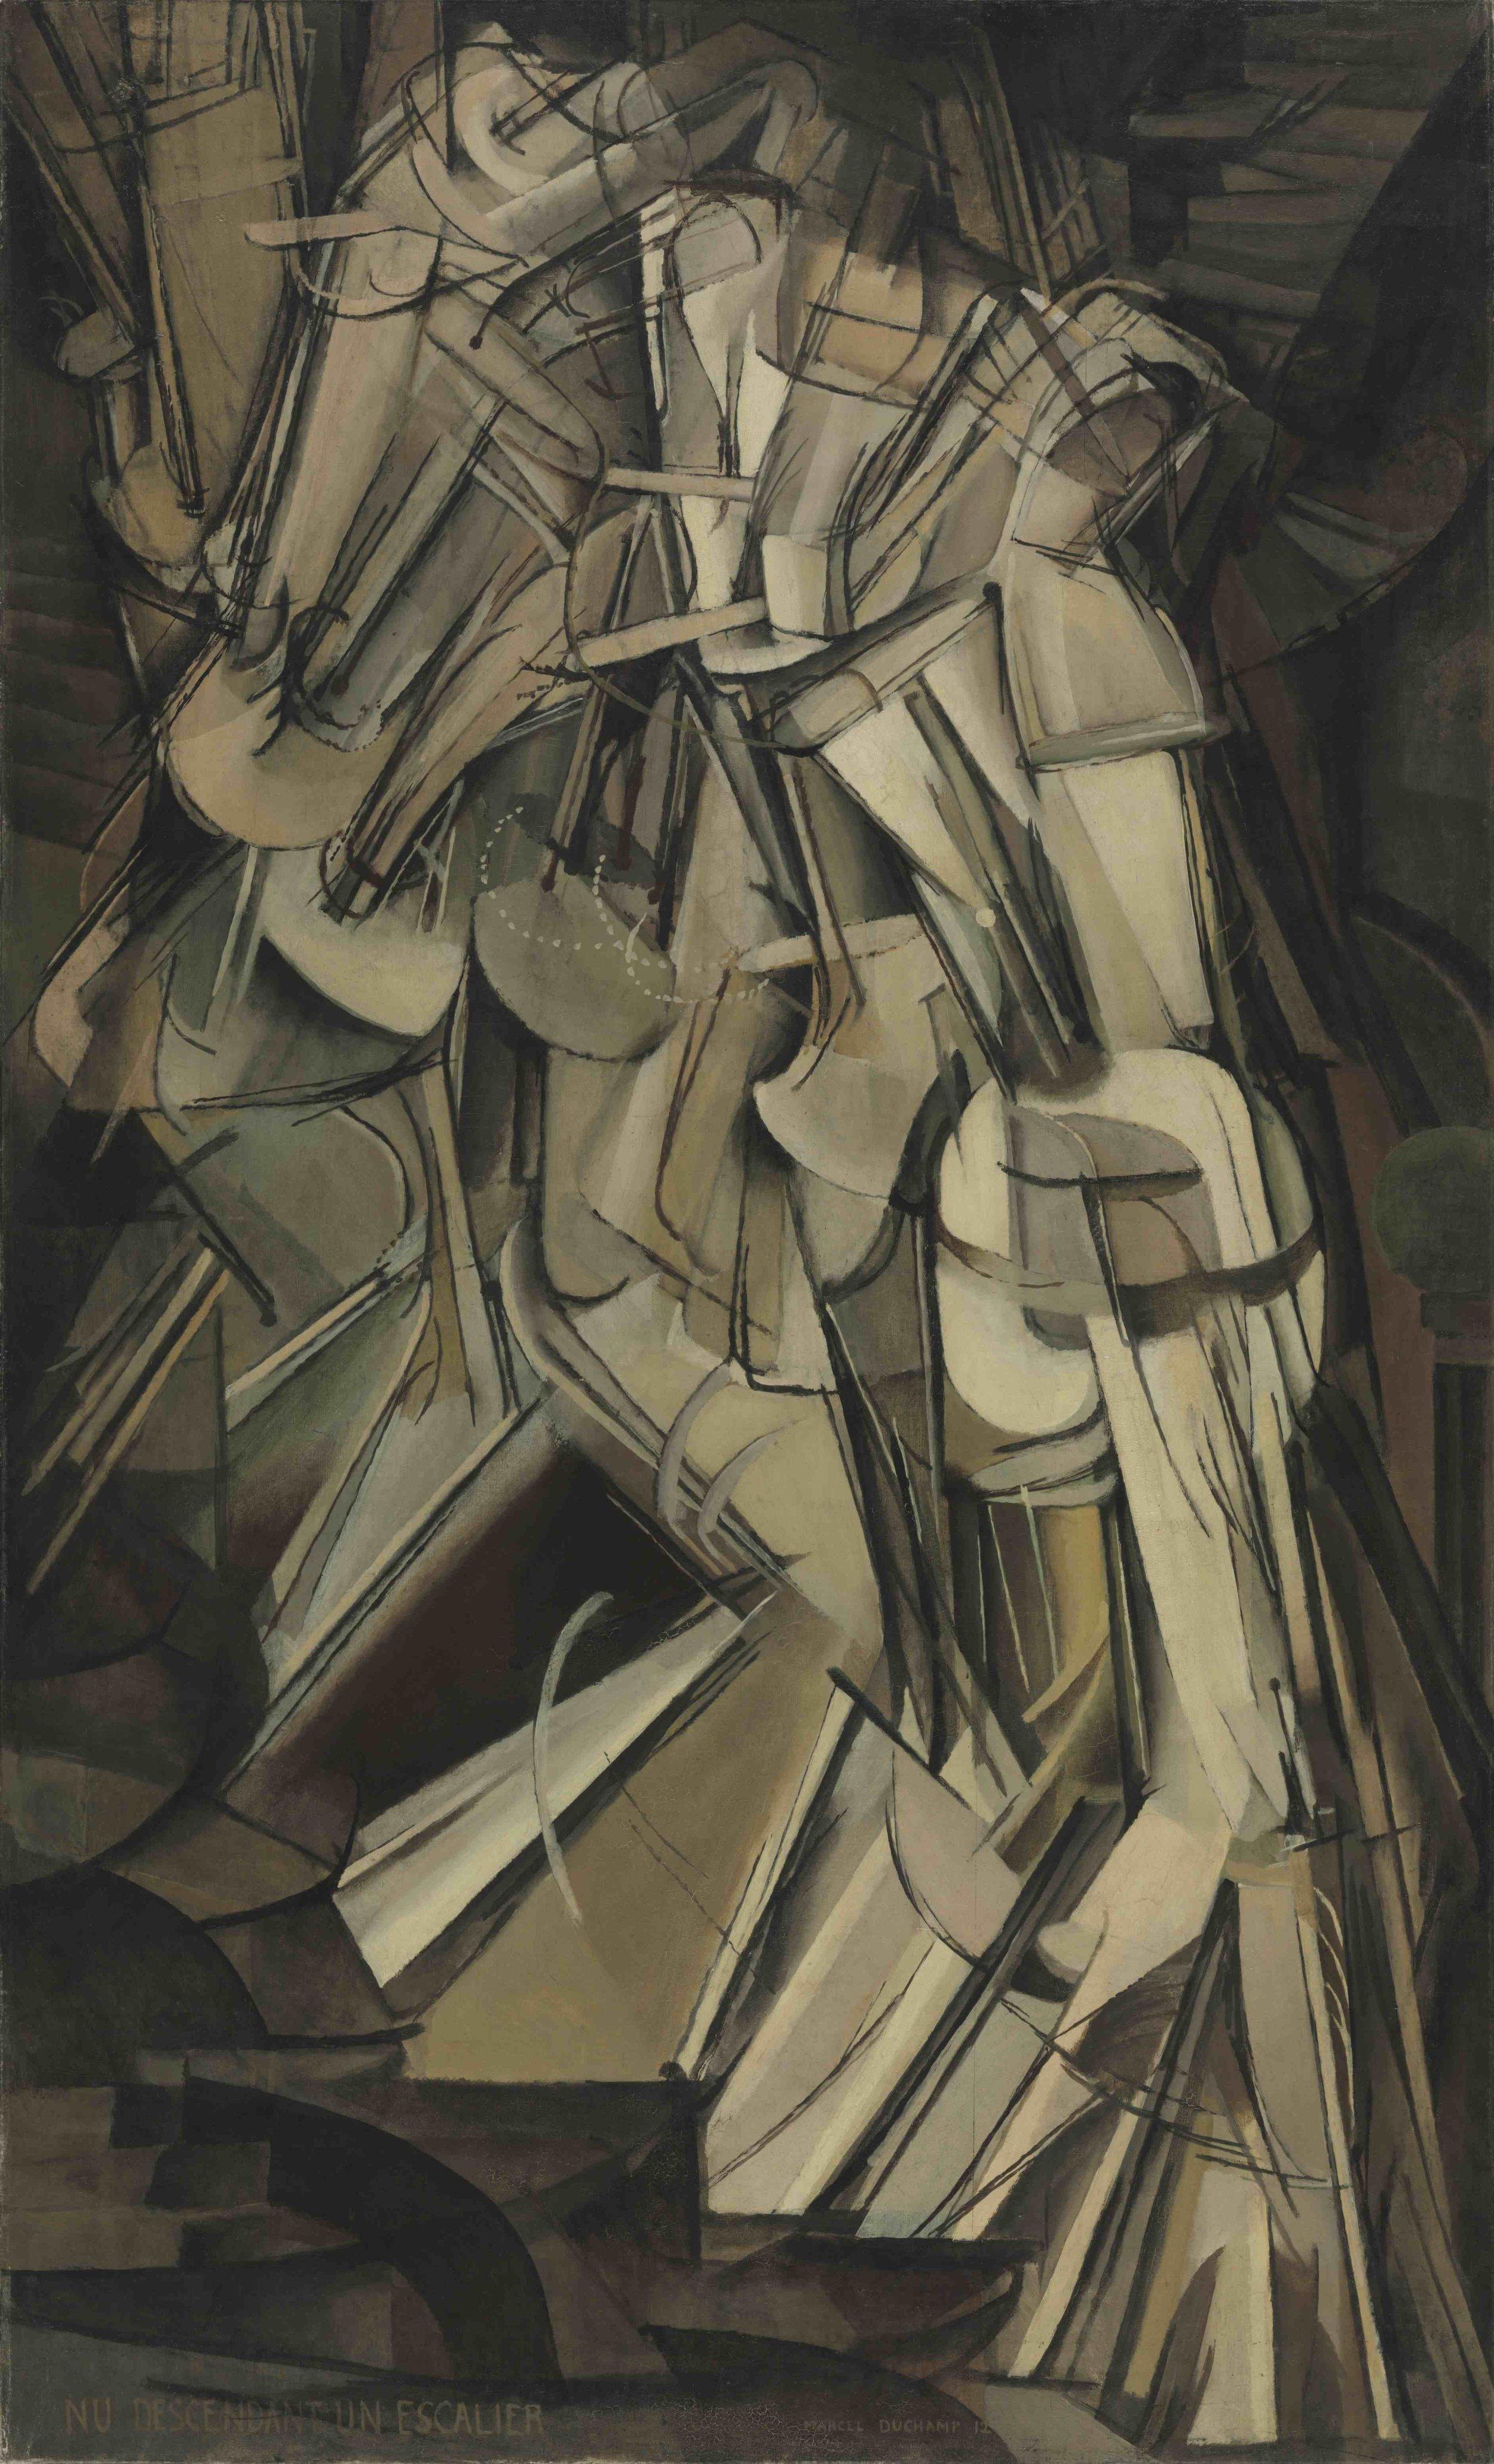 Nude Descending a Staircase , Marcel Duchamp, 1912